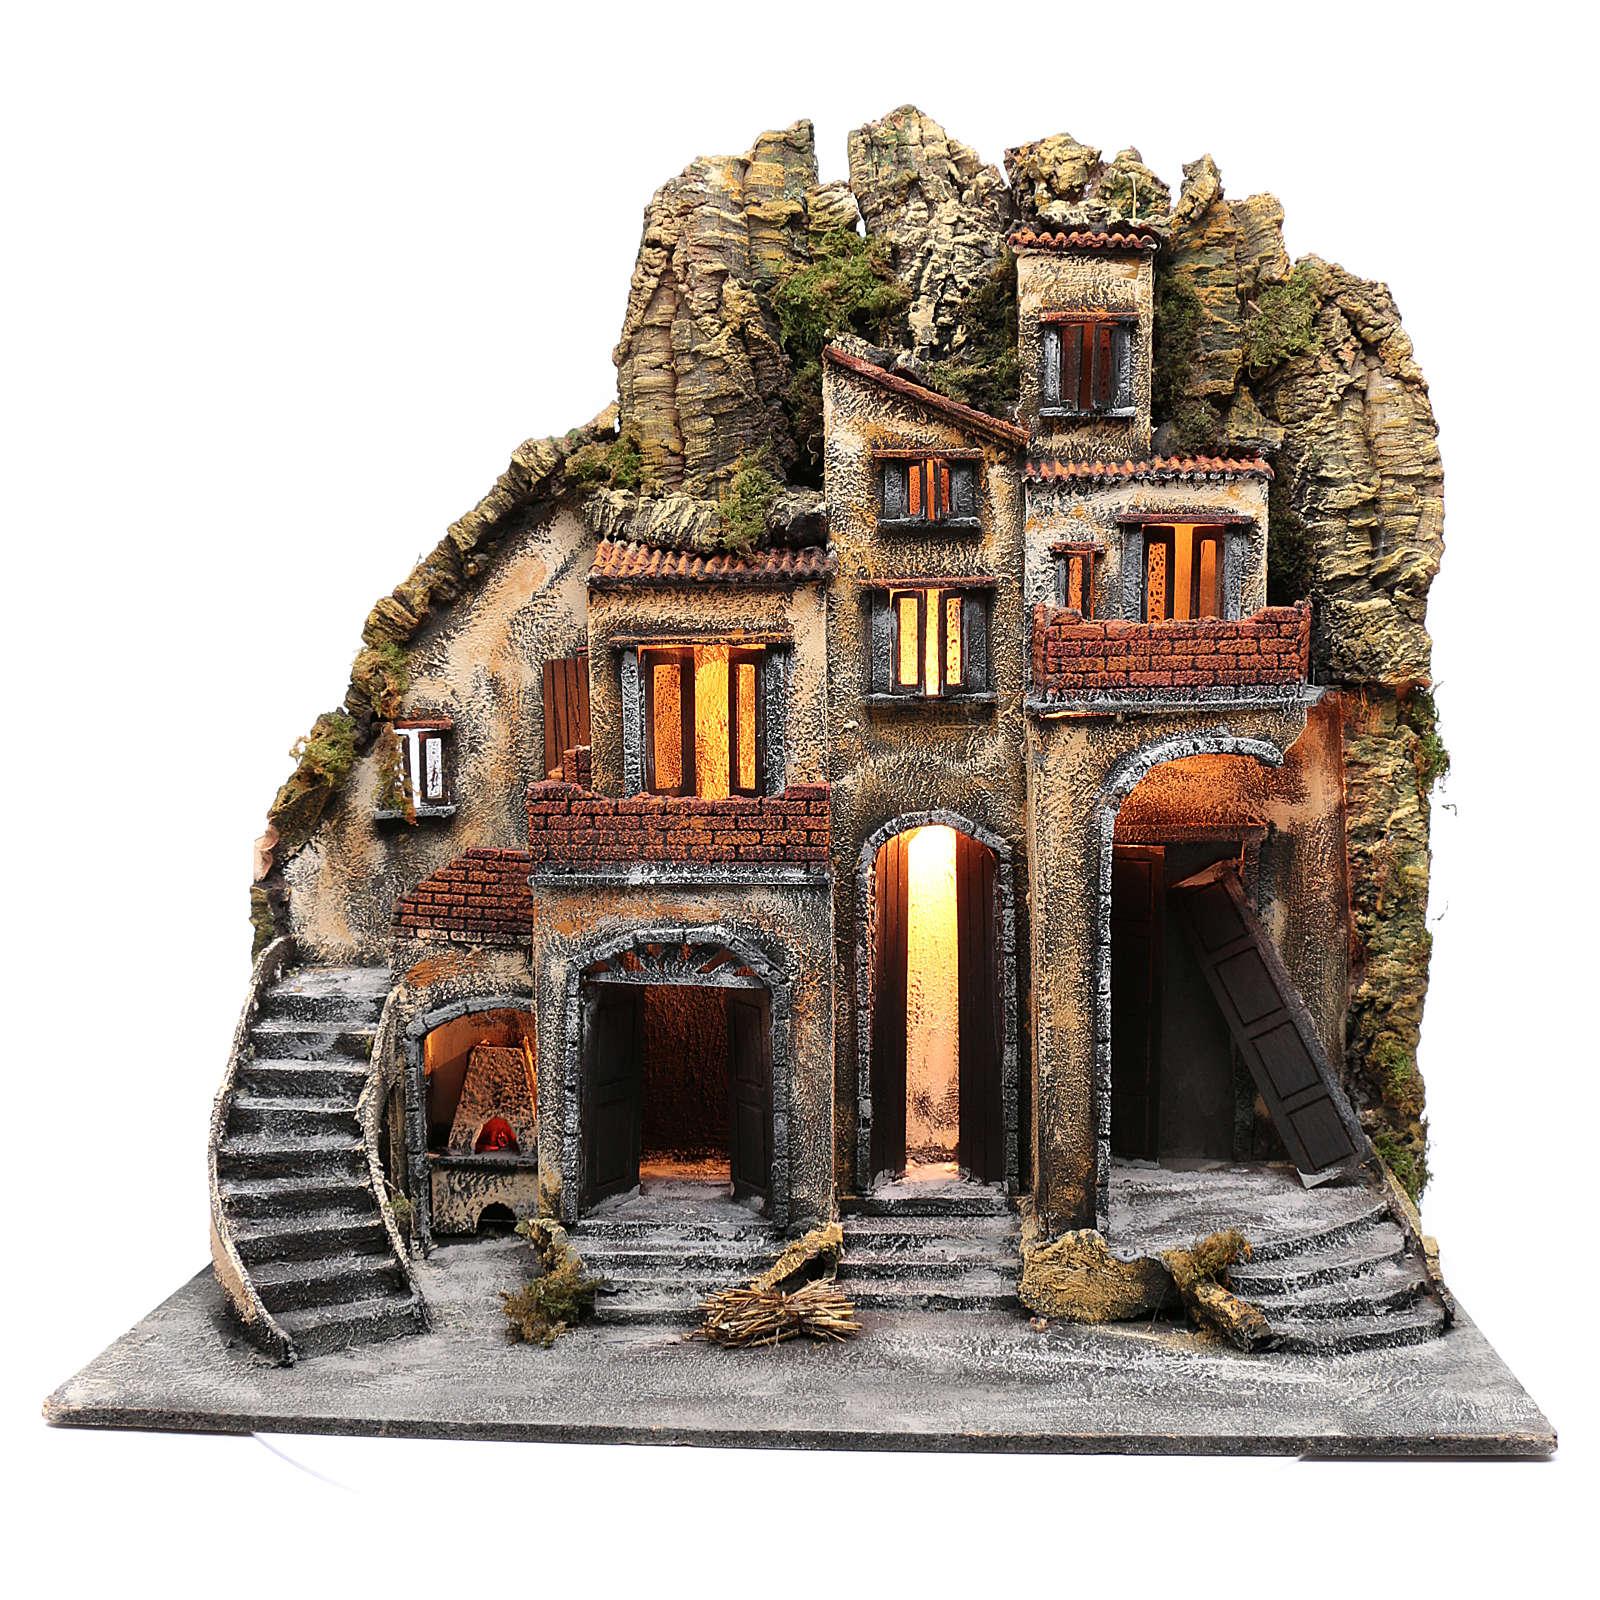 Neapolitan nativity scene village  75x80x40 cm with wooden doors 4